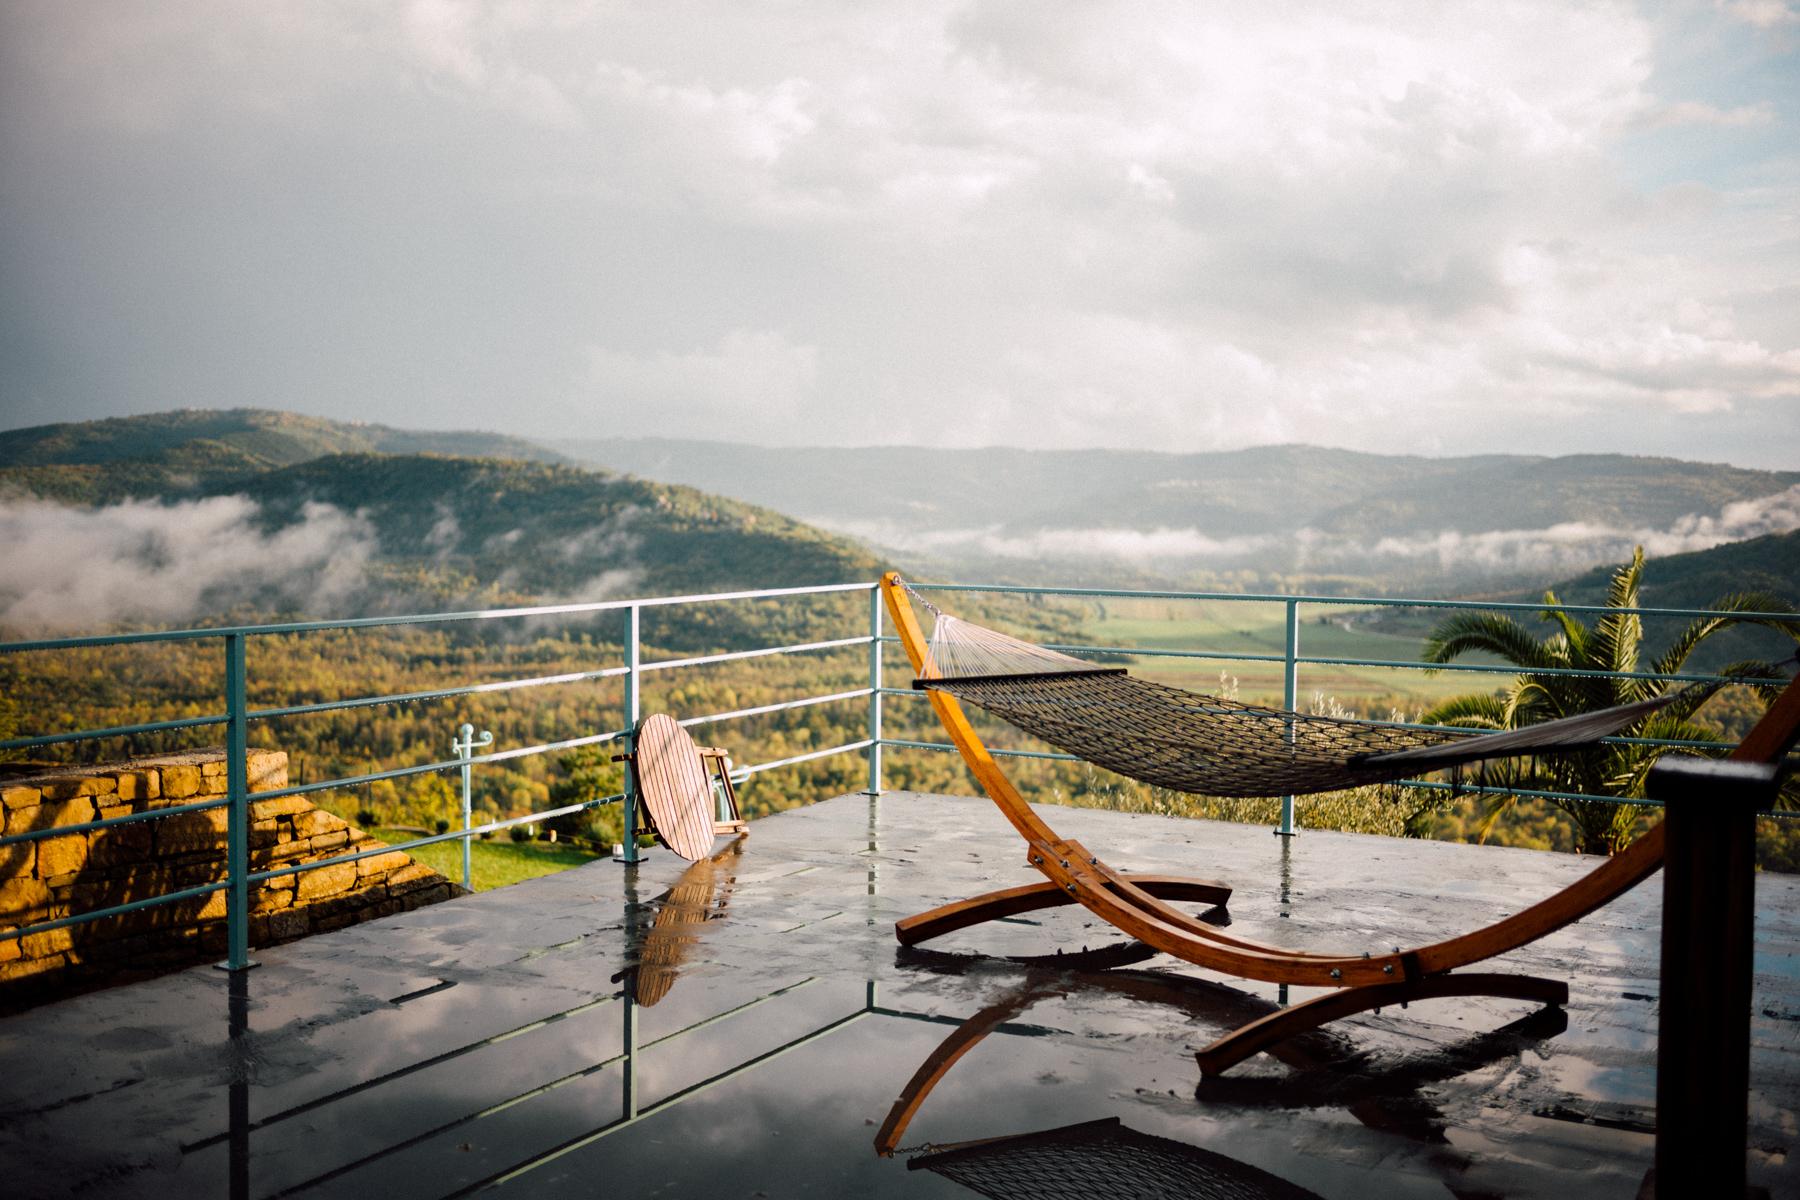 Writer's Hammock in Istria County, Croatia. Photo by Malika Ali Harding.